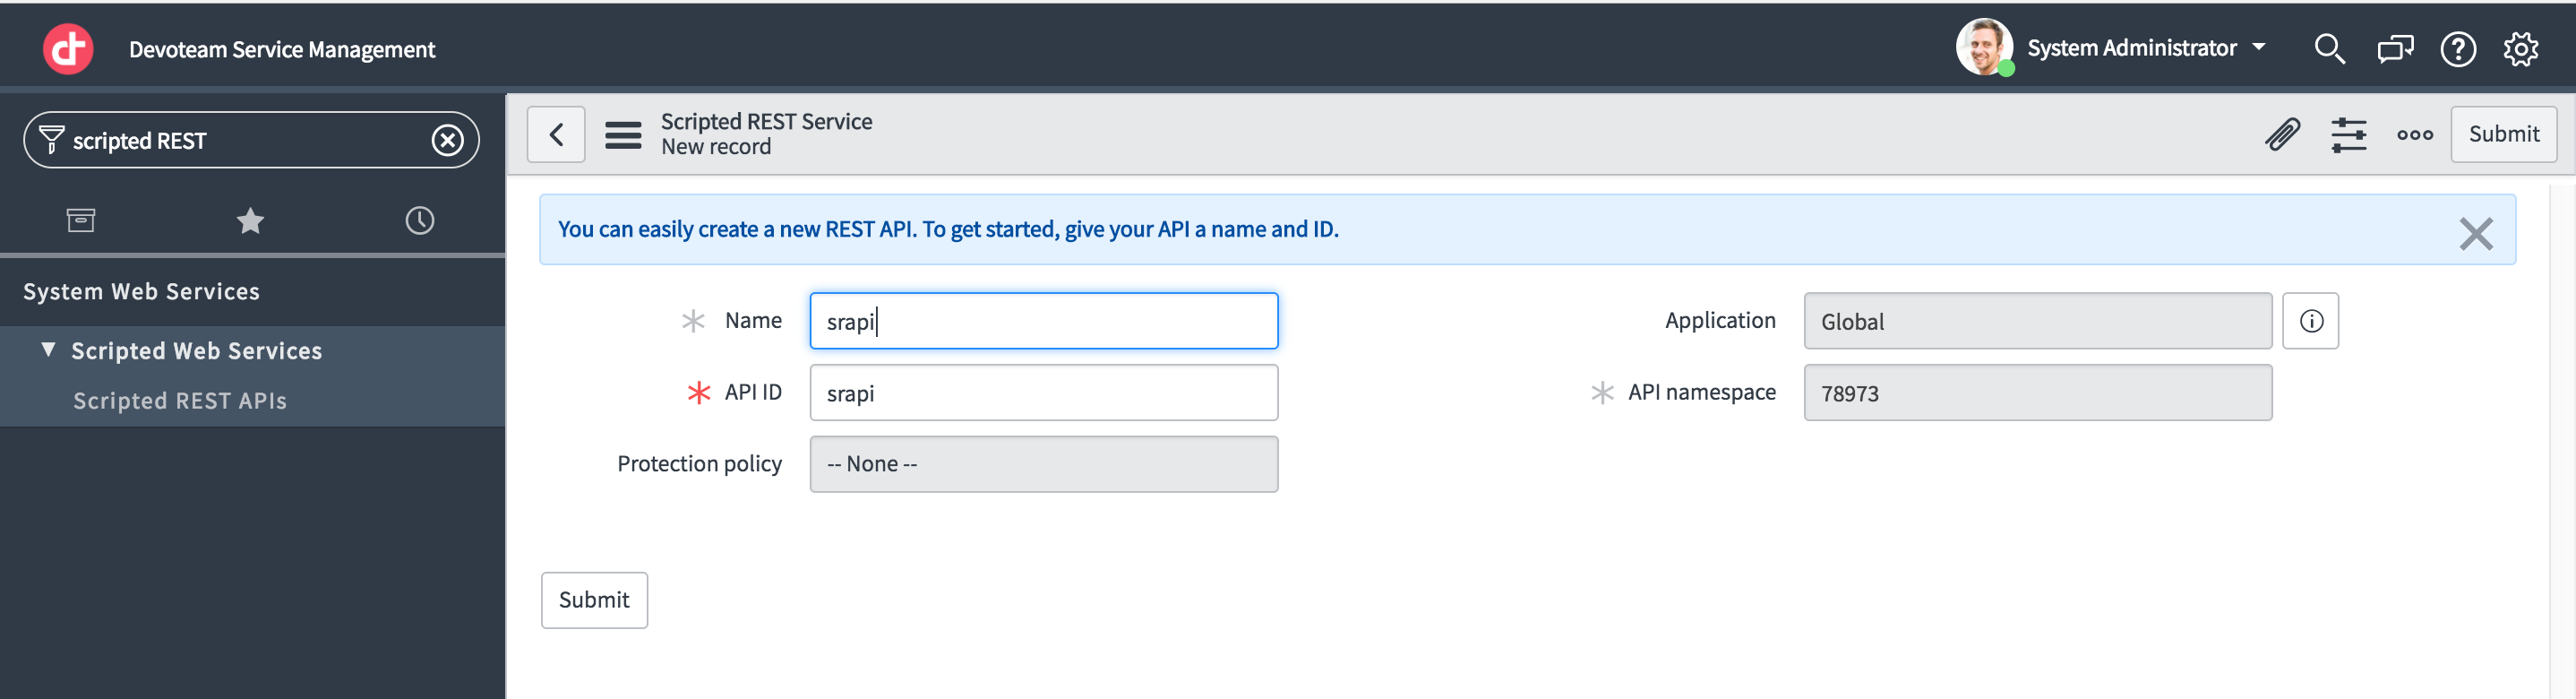 SN-API-Examples/api md at master · avwsolutions/SN-API-Examples · GitHub